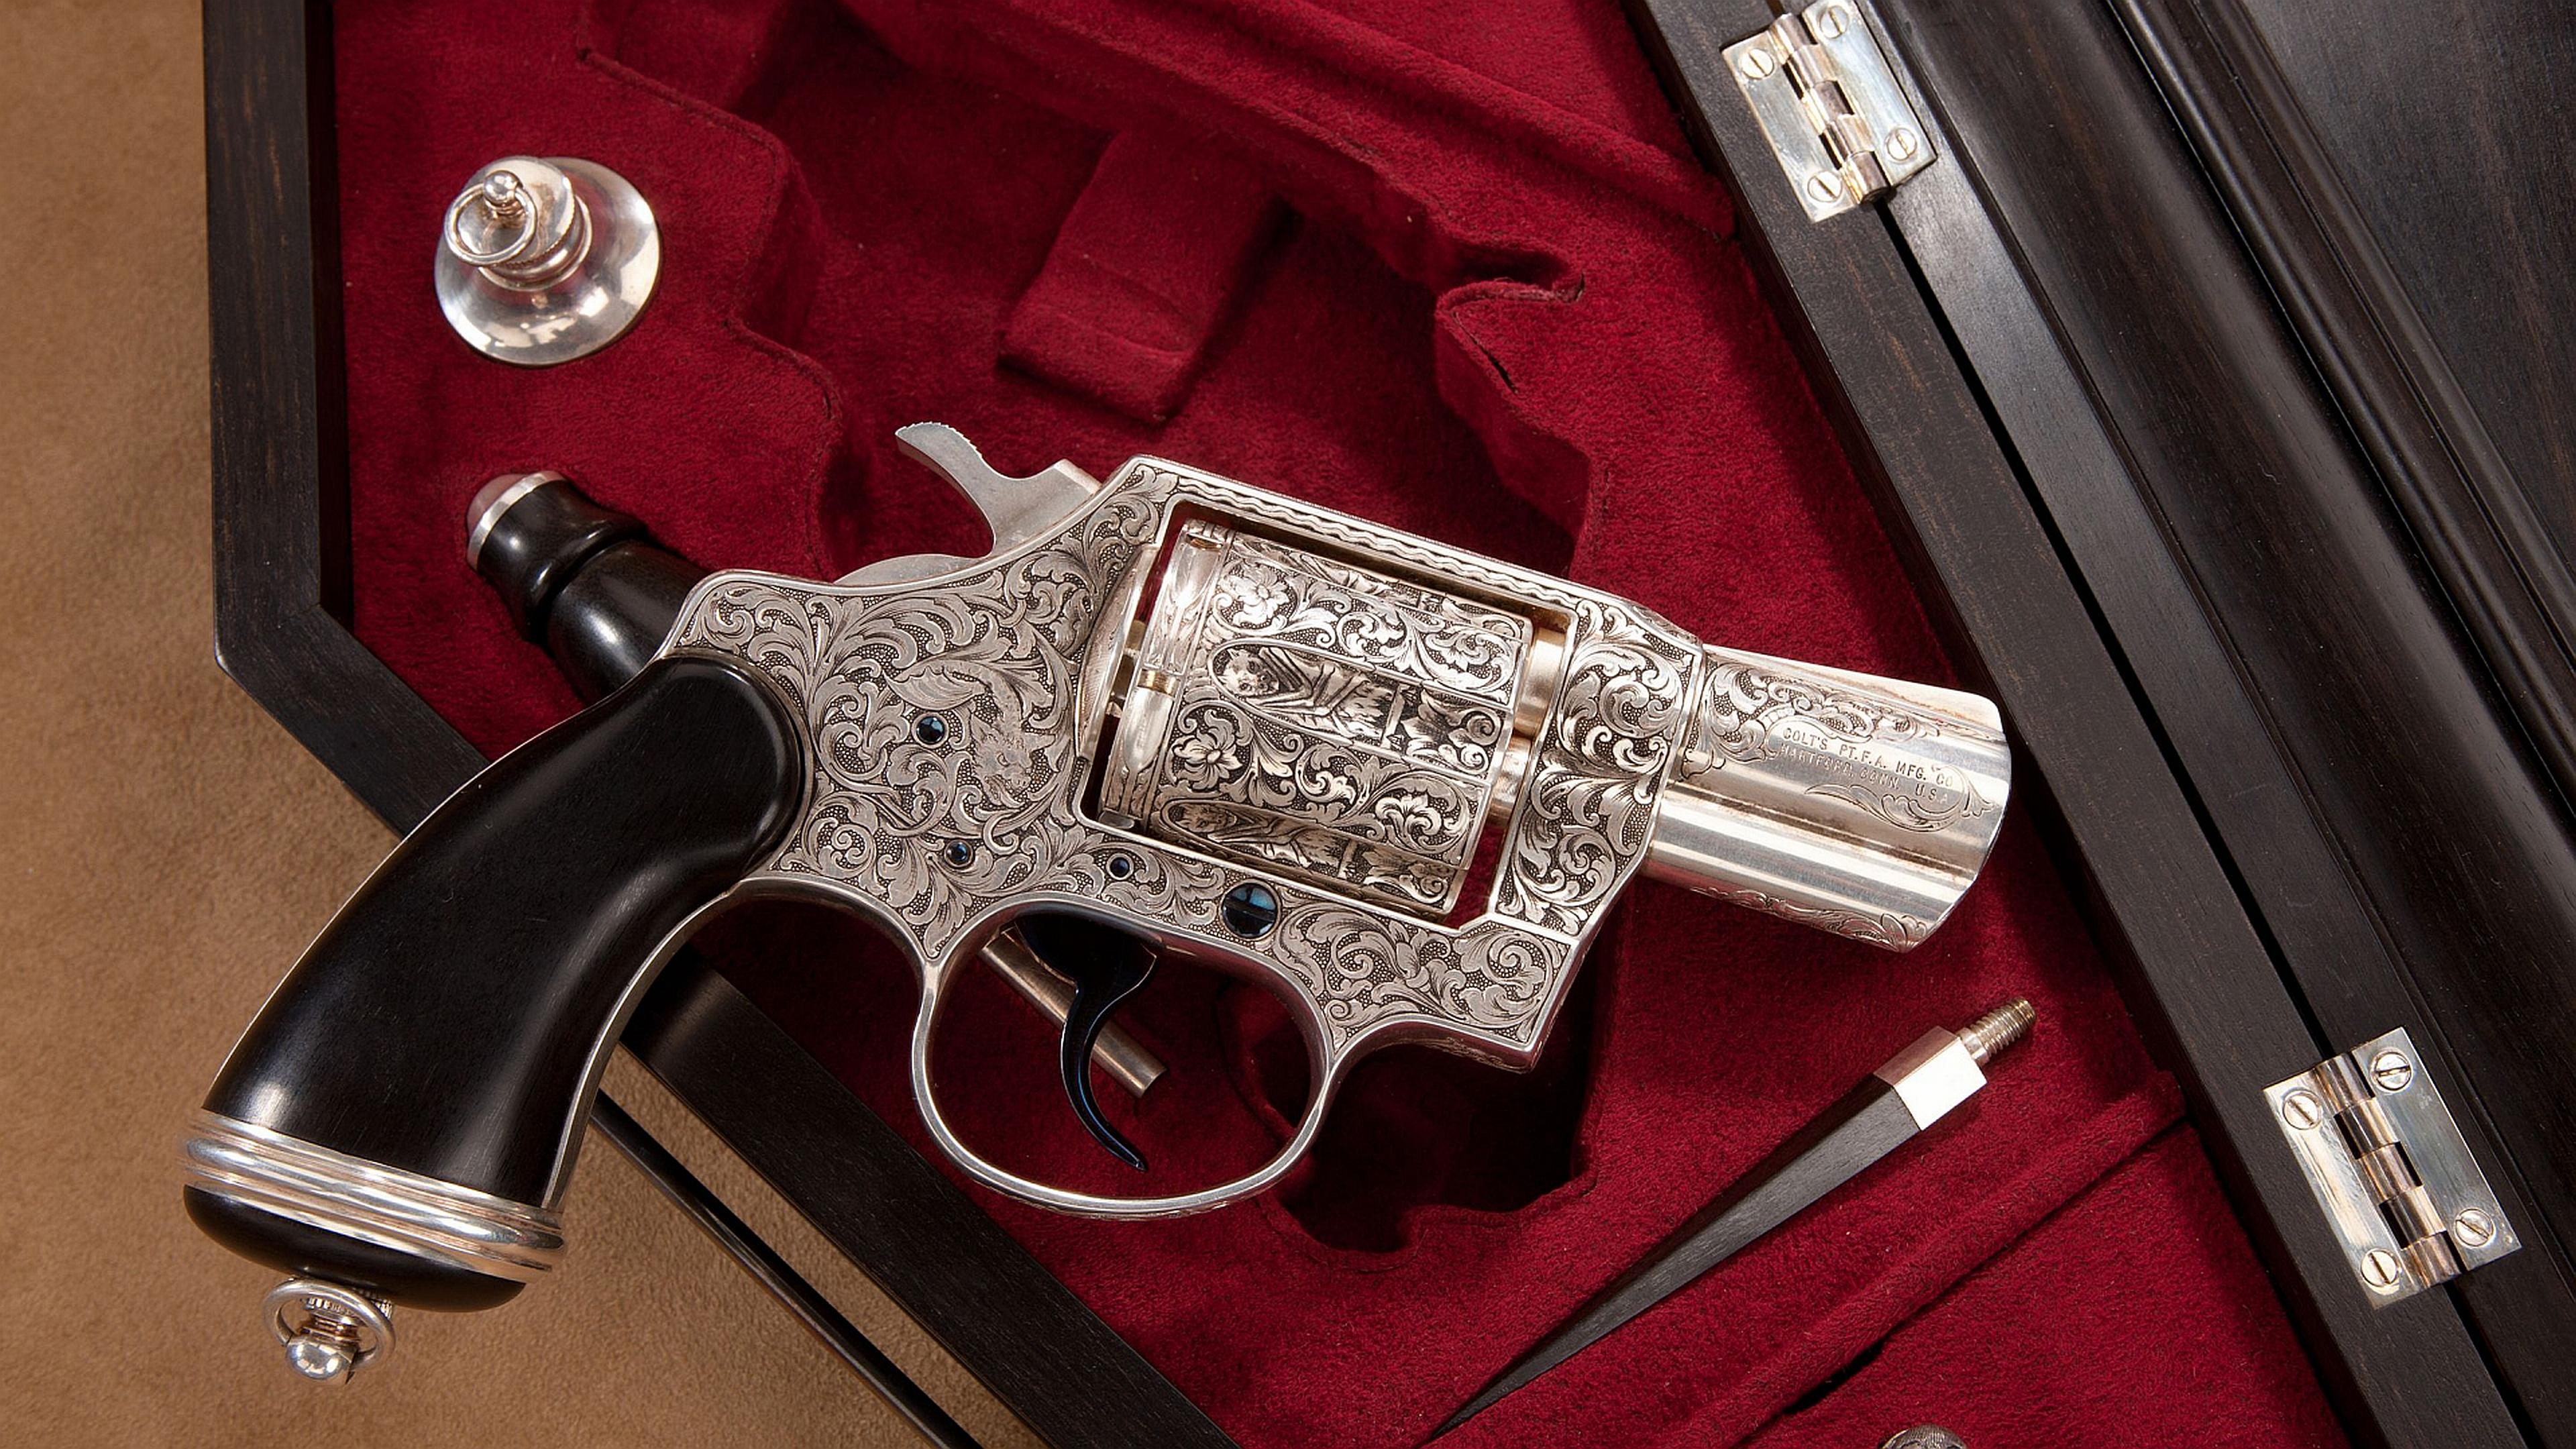 High Resolution Wallpaper | Colt Revolver 3840x2160 px